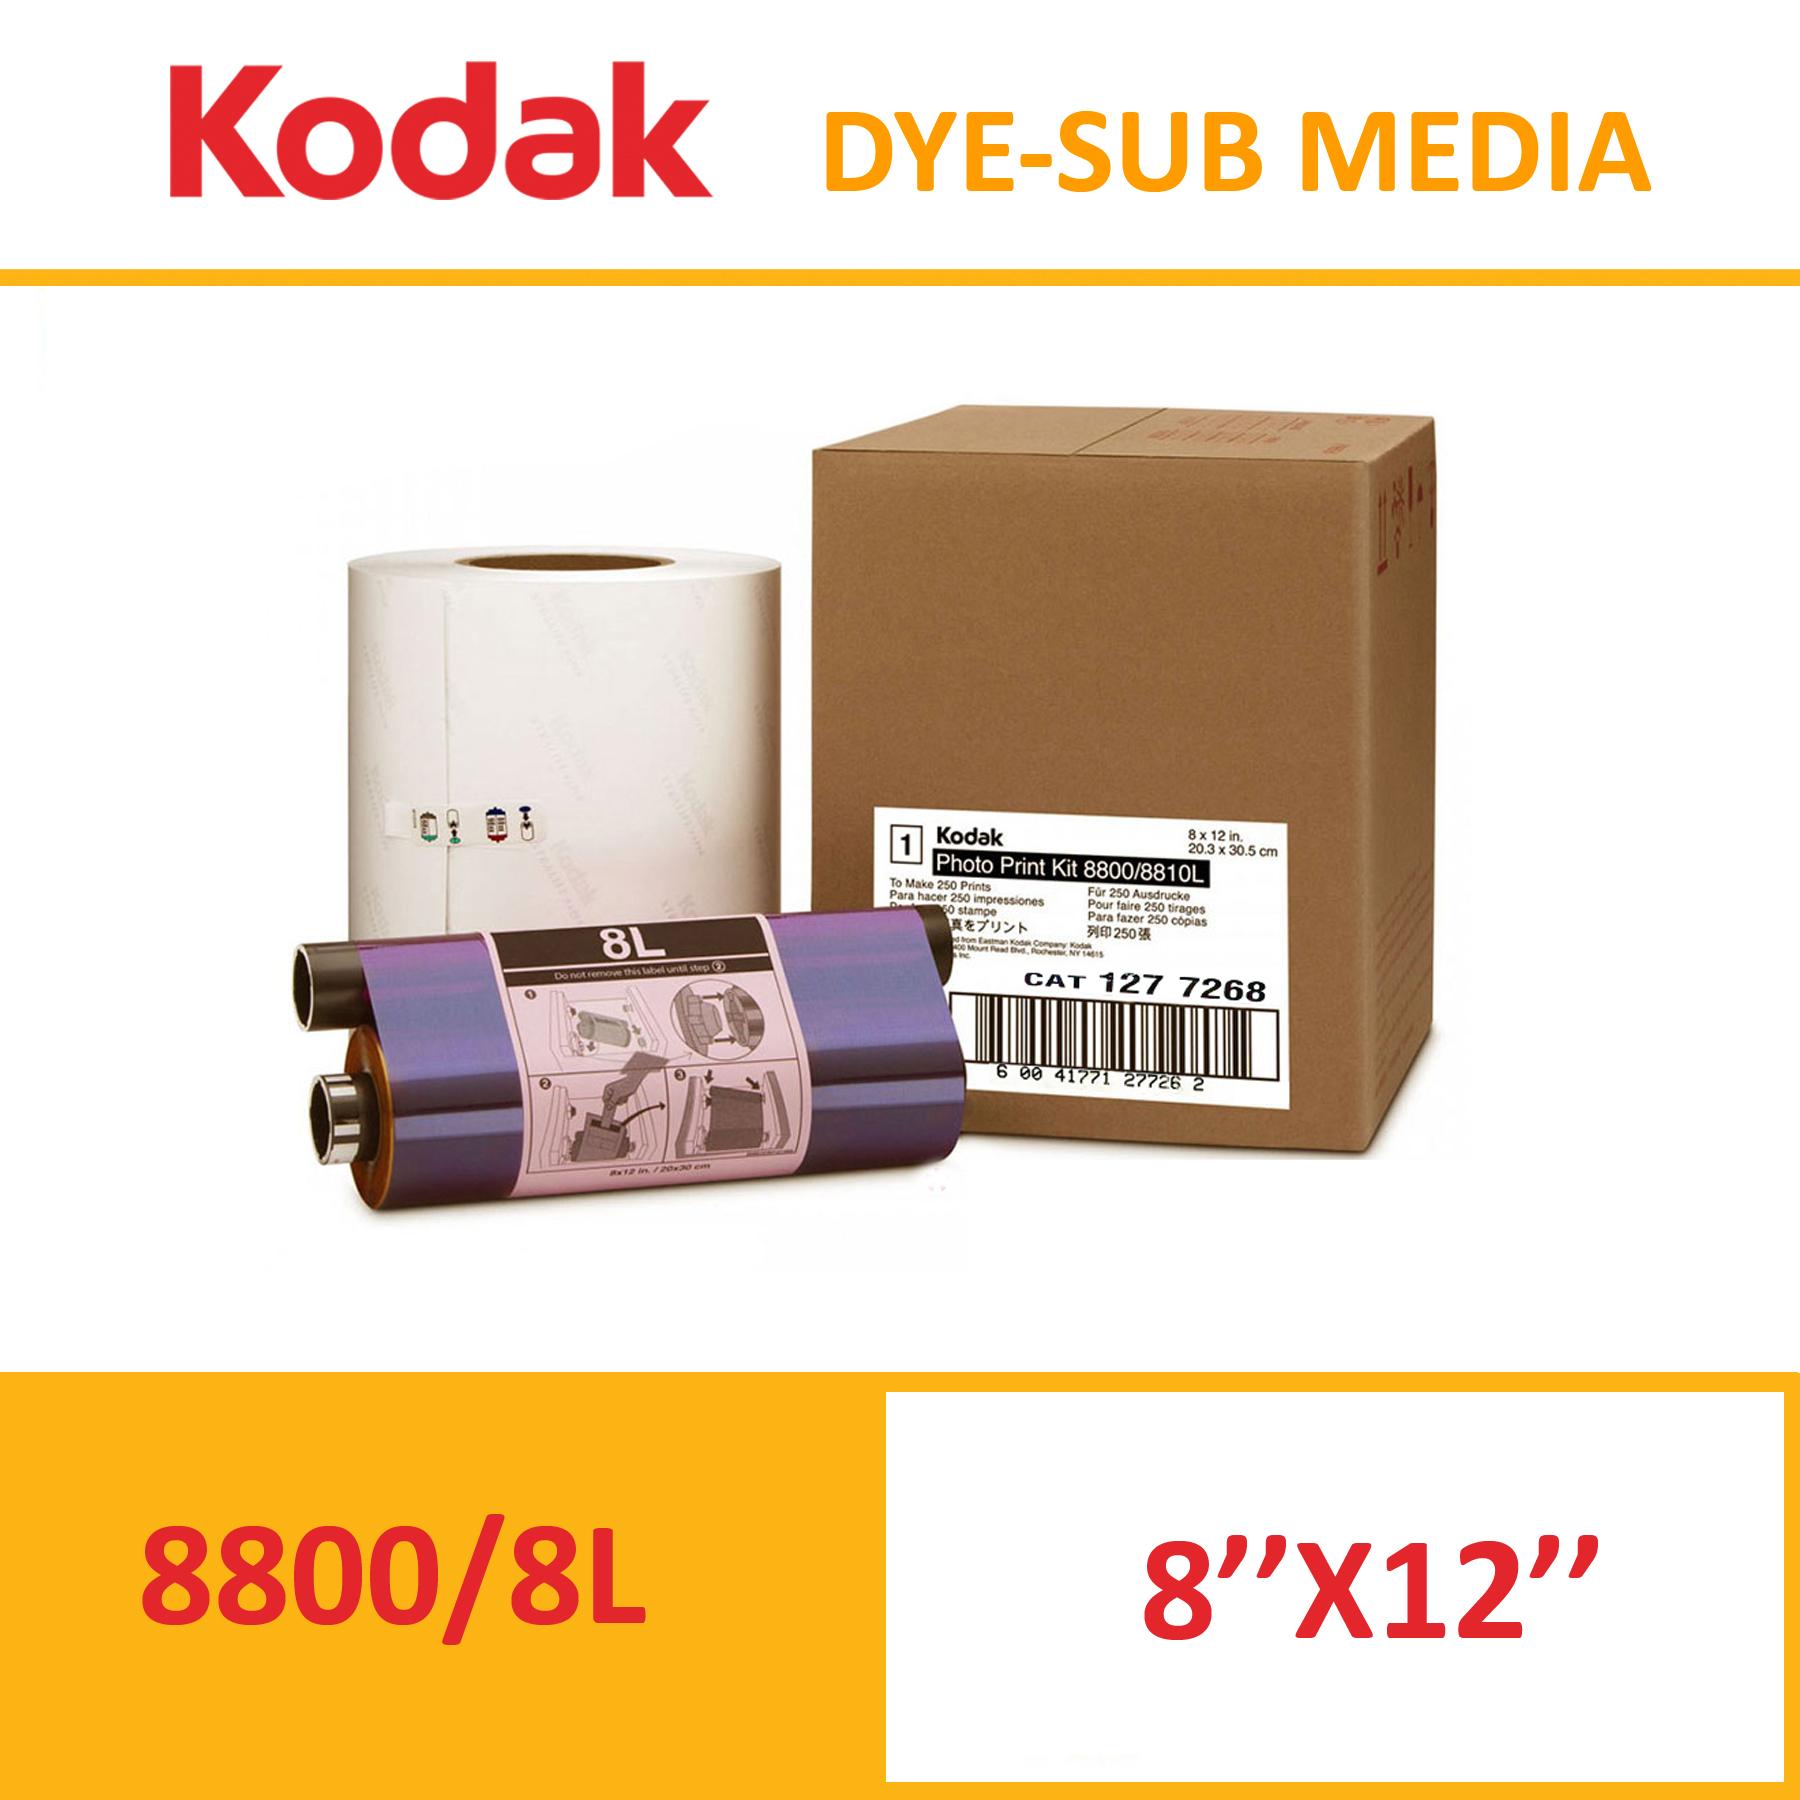 Kodak 8800/8810 Dye-Sub Photo Printer Media Kit